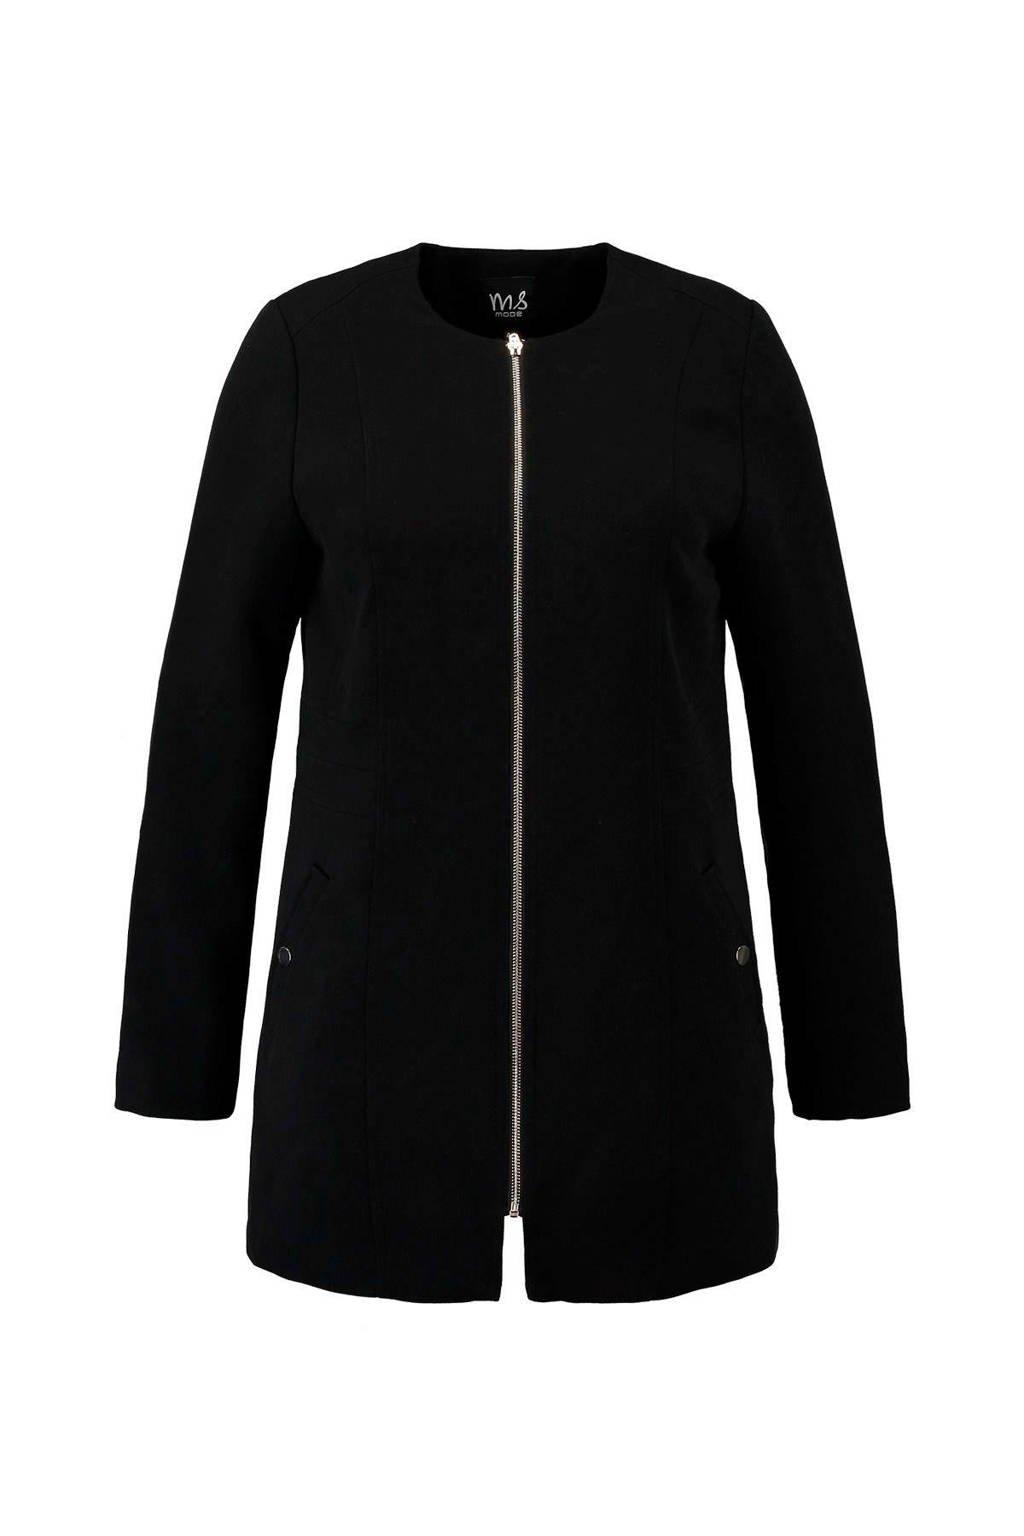 MS Mode tussenjas zwart, Zwart